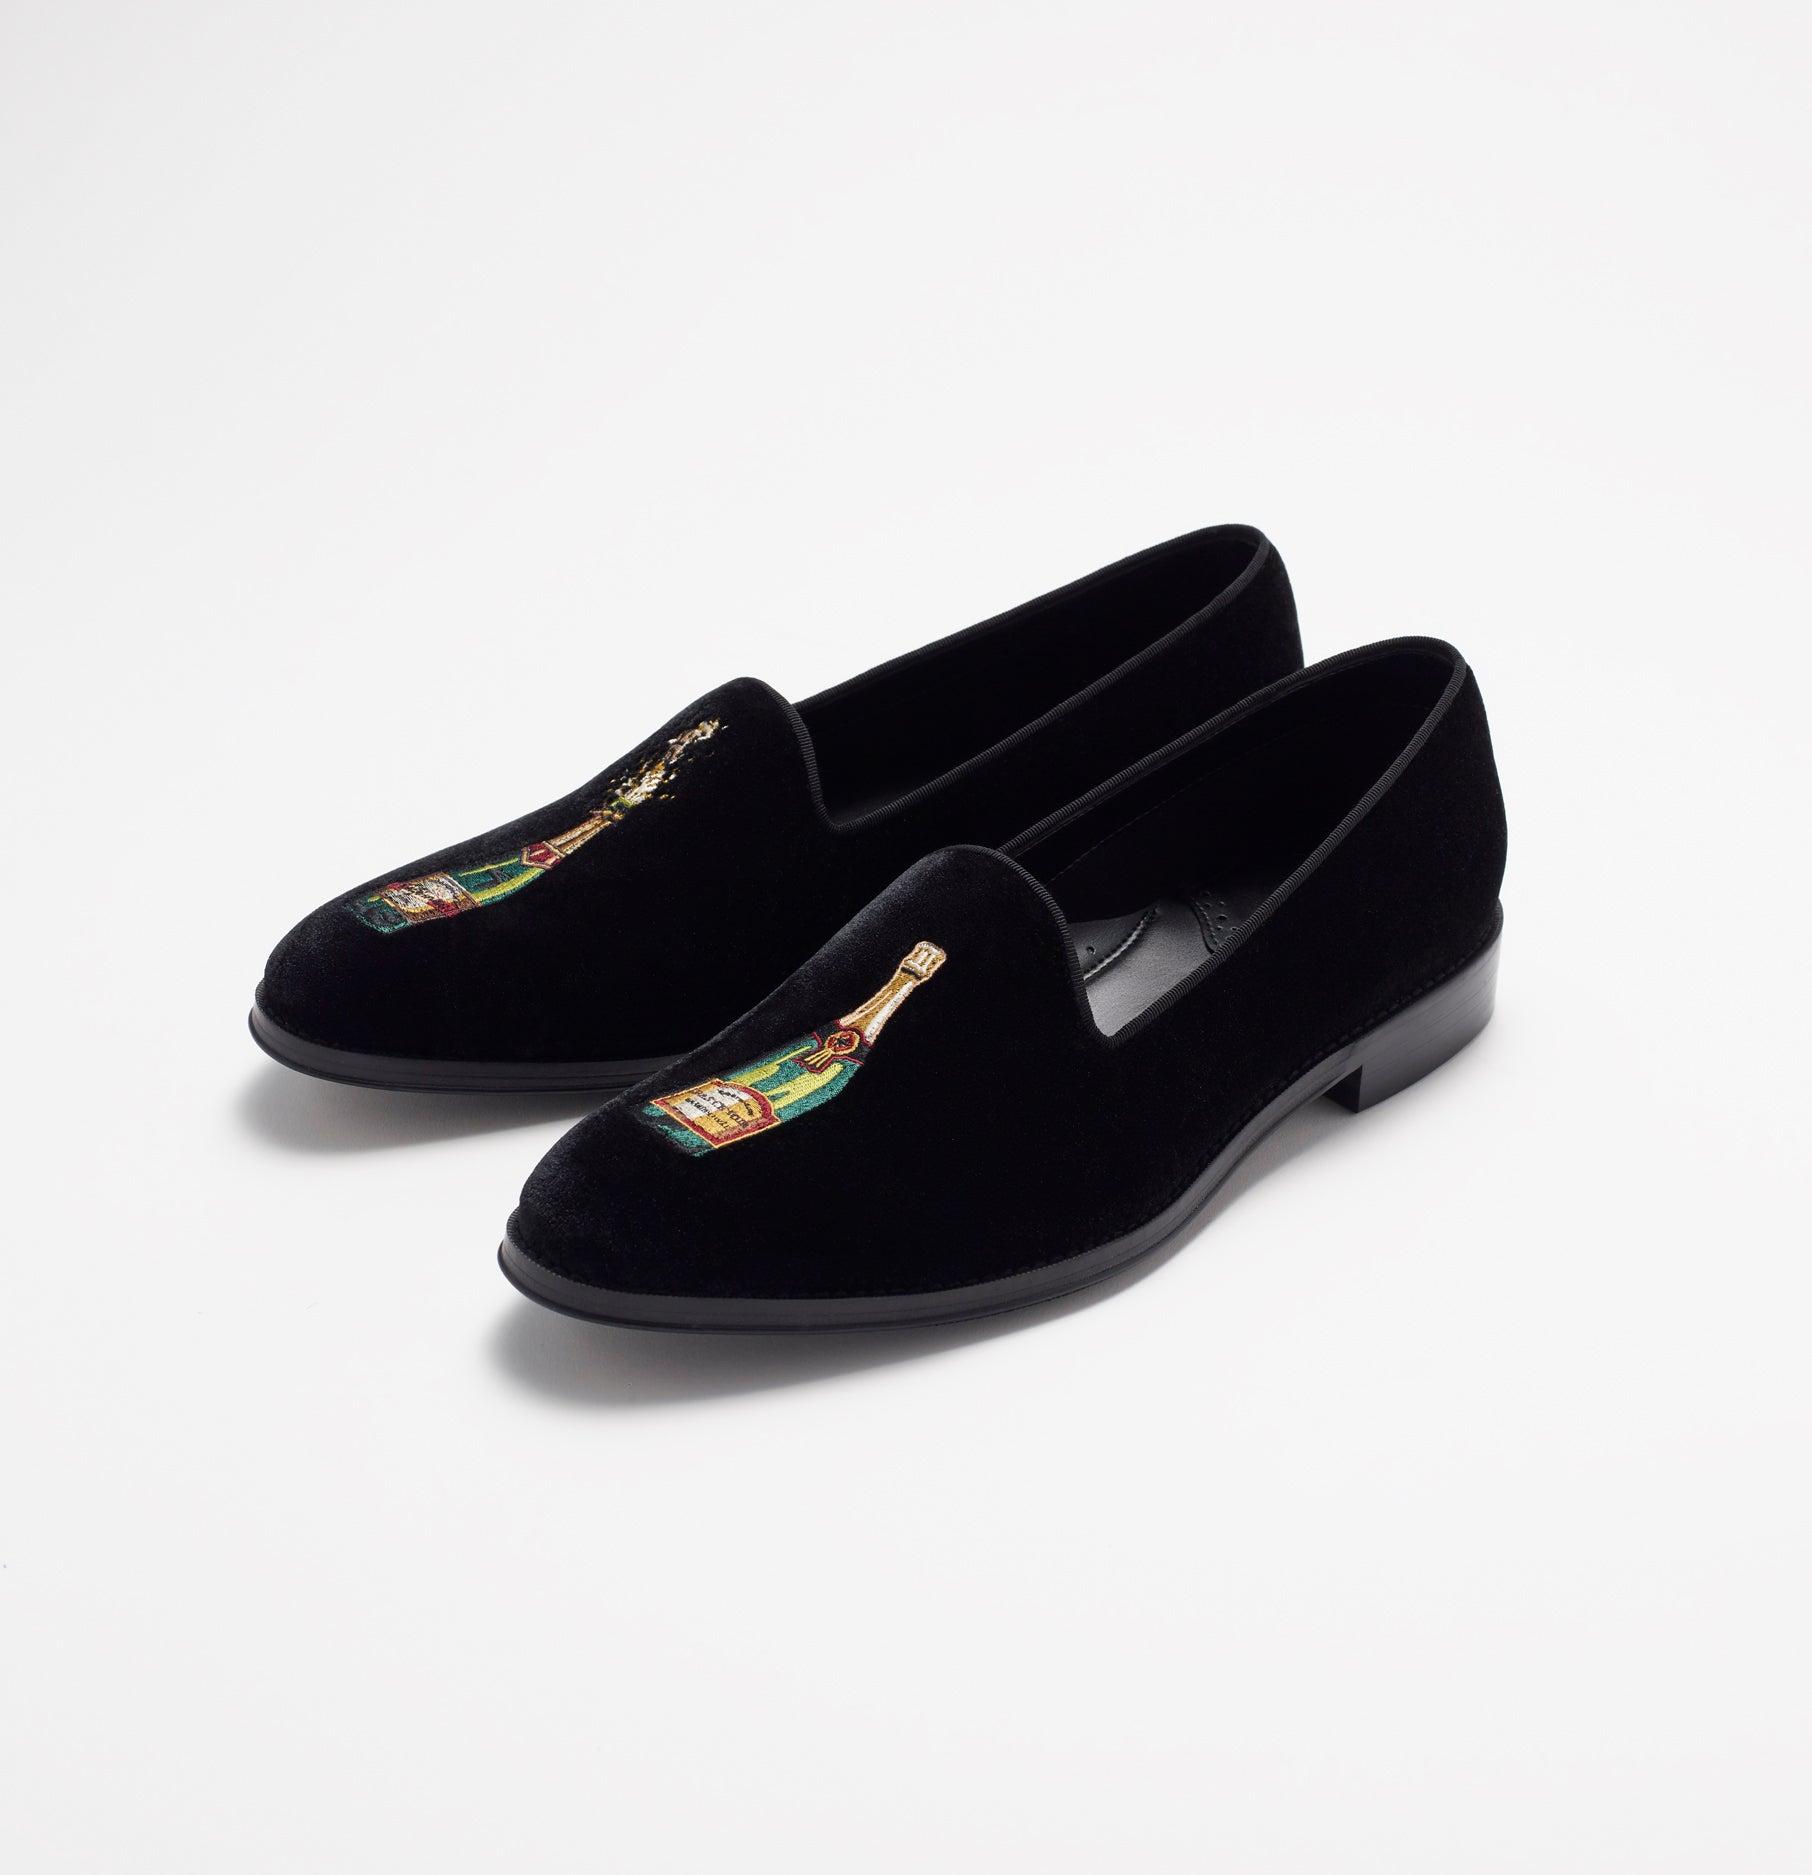 935c22ee26fe2 Cheers! Black Velvet Loafers | The Black Tux | The Black Tux